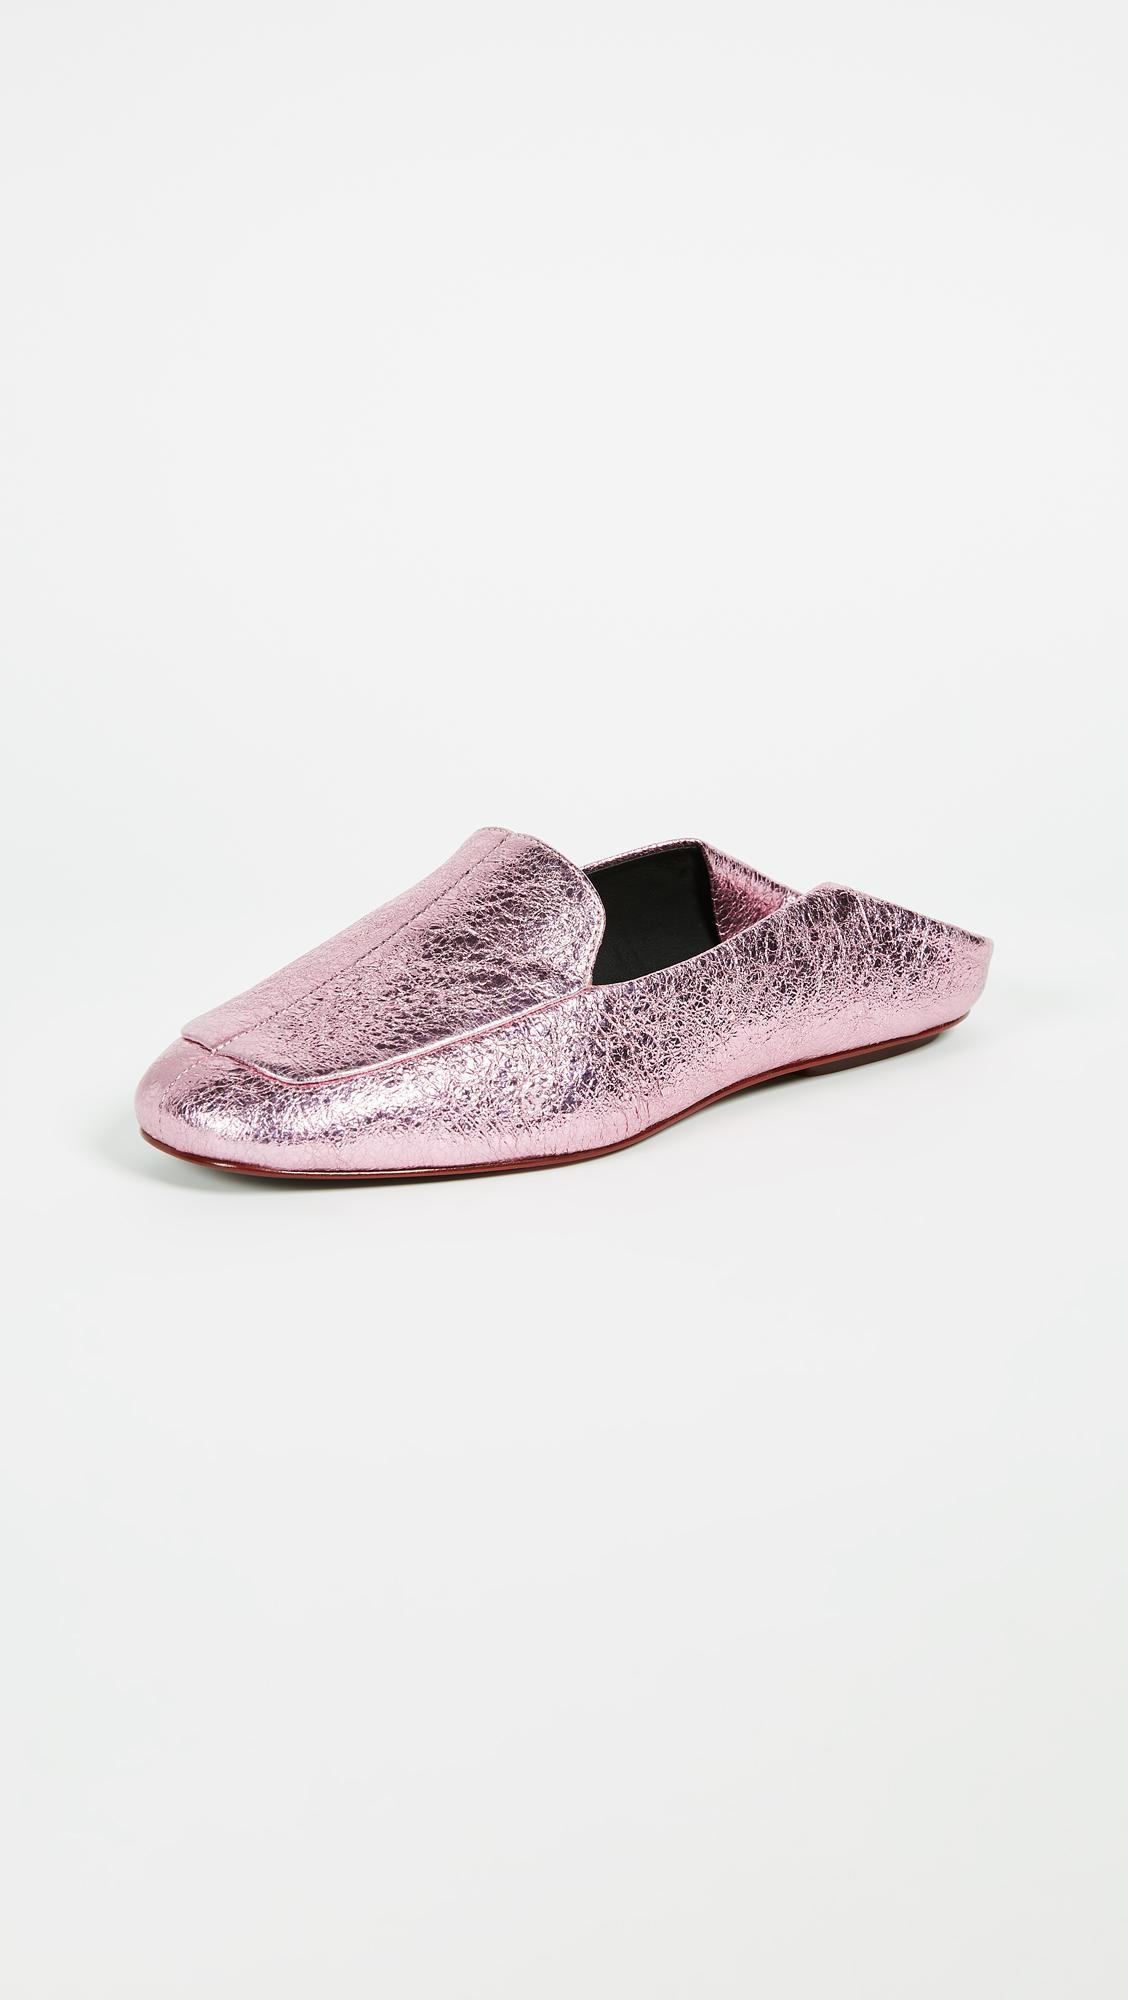 shopping online cheap online Tibi Metallic Cecil Mules sale footlocker finishline choice sale online RU2FQaf